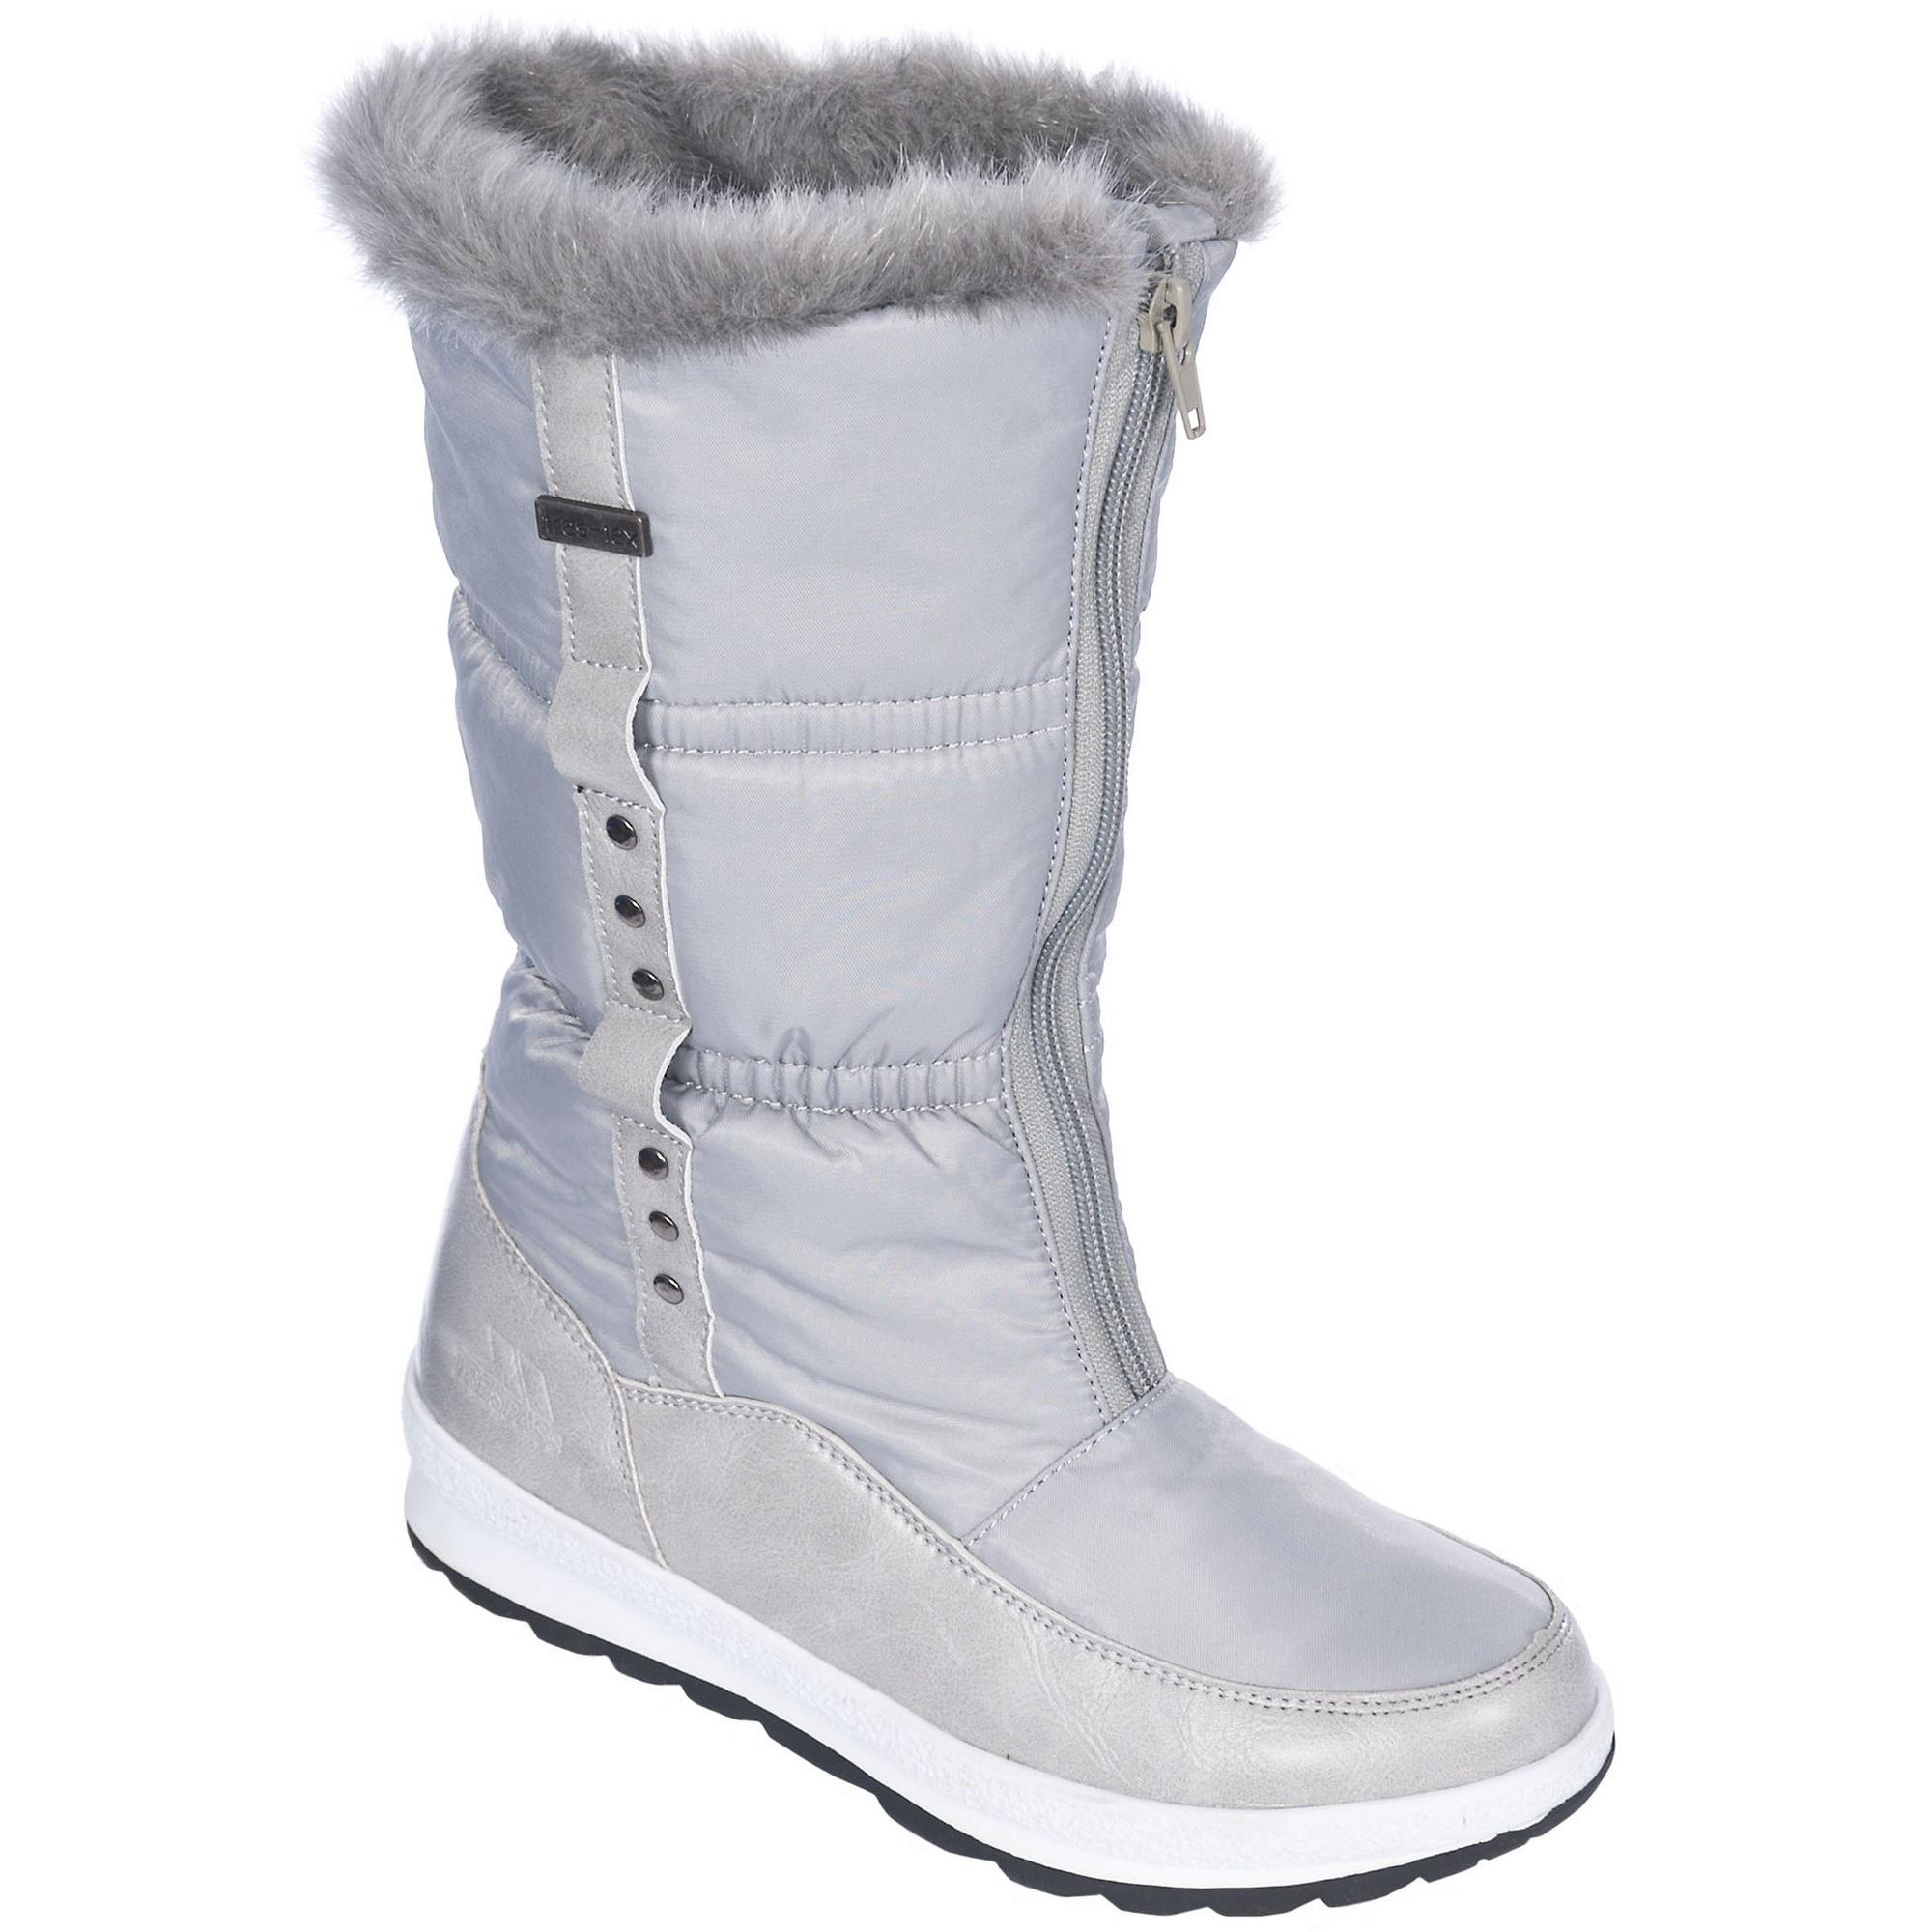 trespass virgo womens waterproof winter snow boots